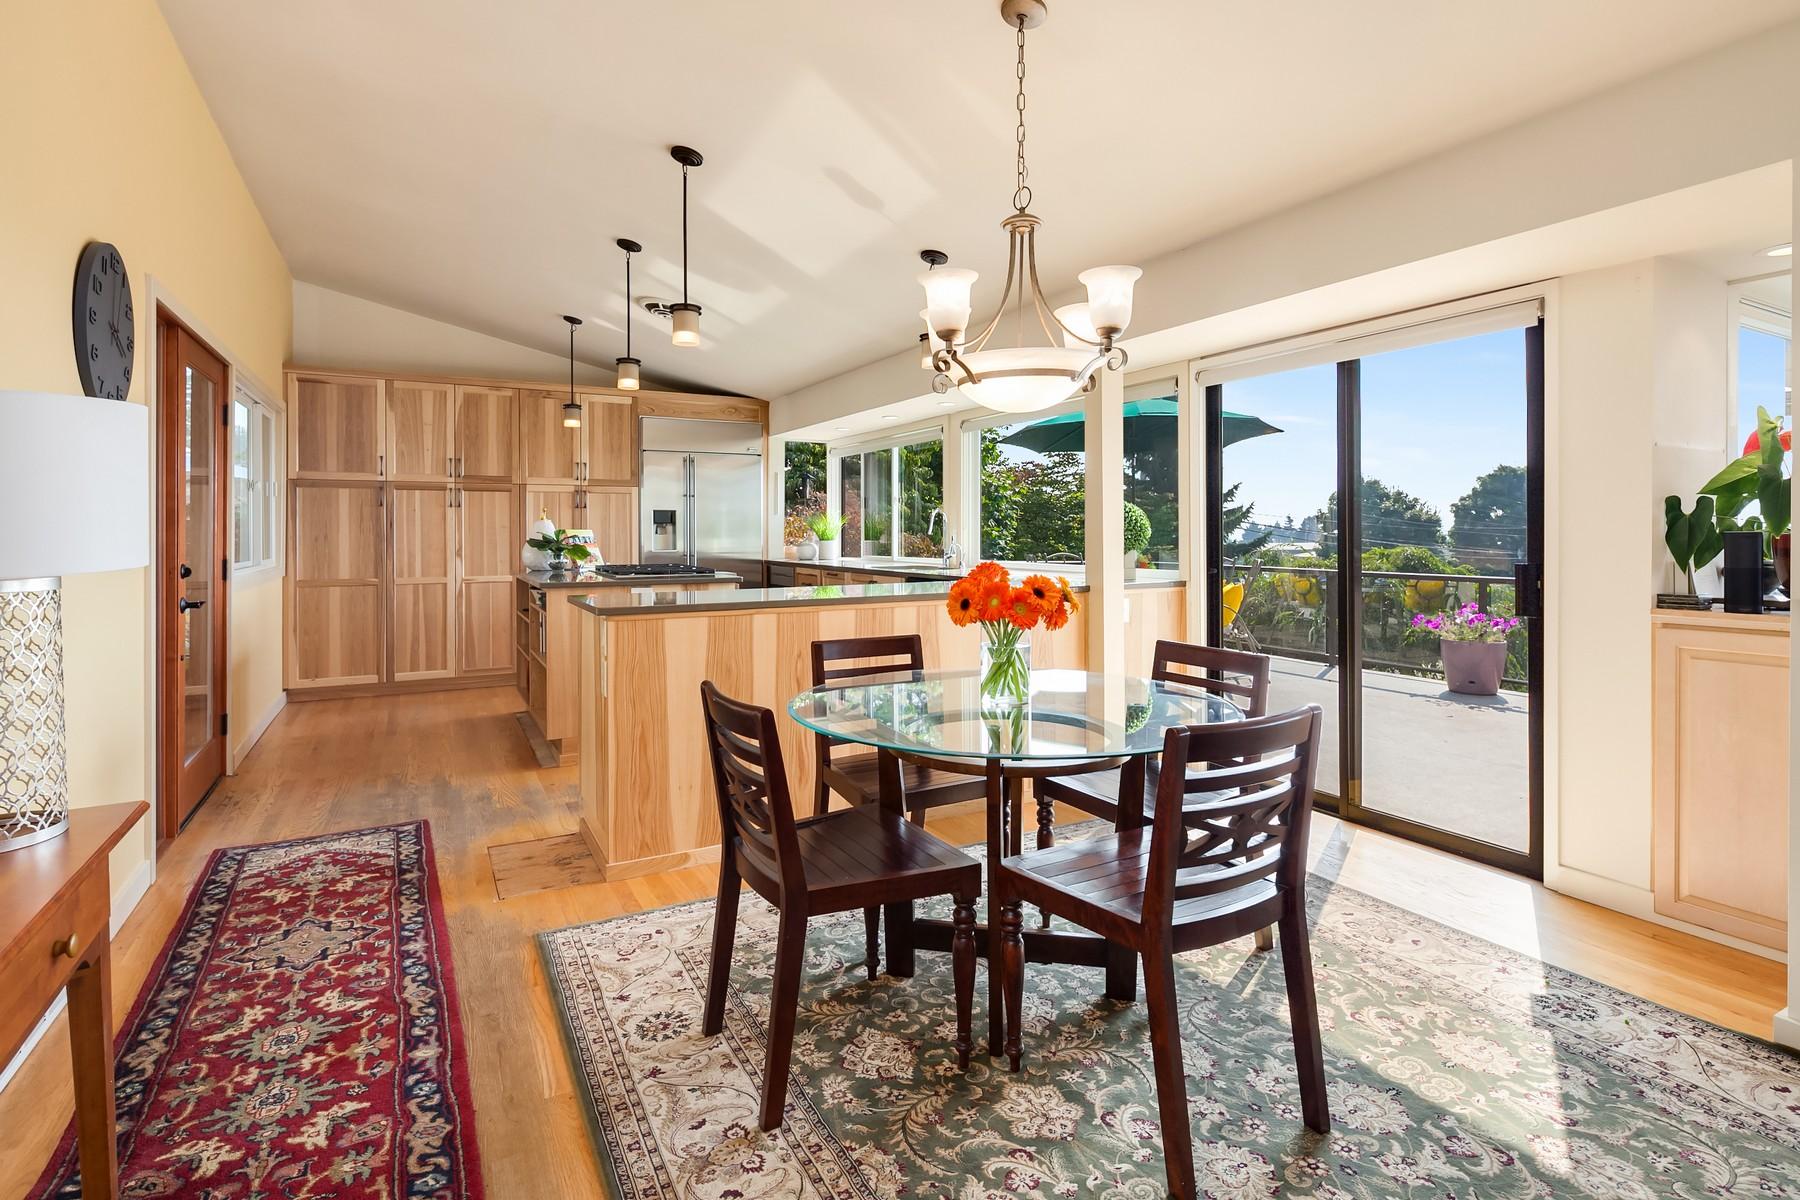 Additional photo for property listing at Kirkland Mid-Century Rambler 6500 113th Ave NE Kirkland, Washington 98033 United States